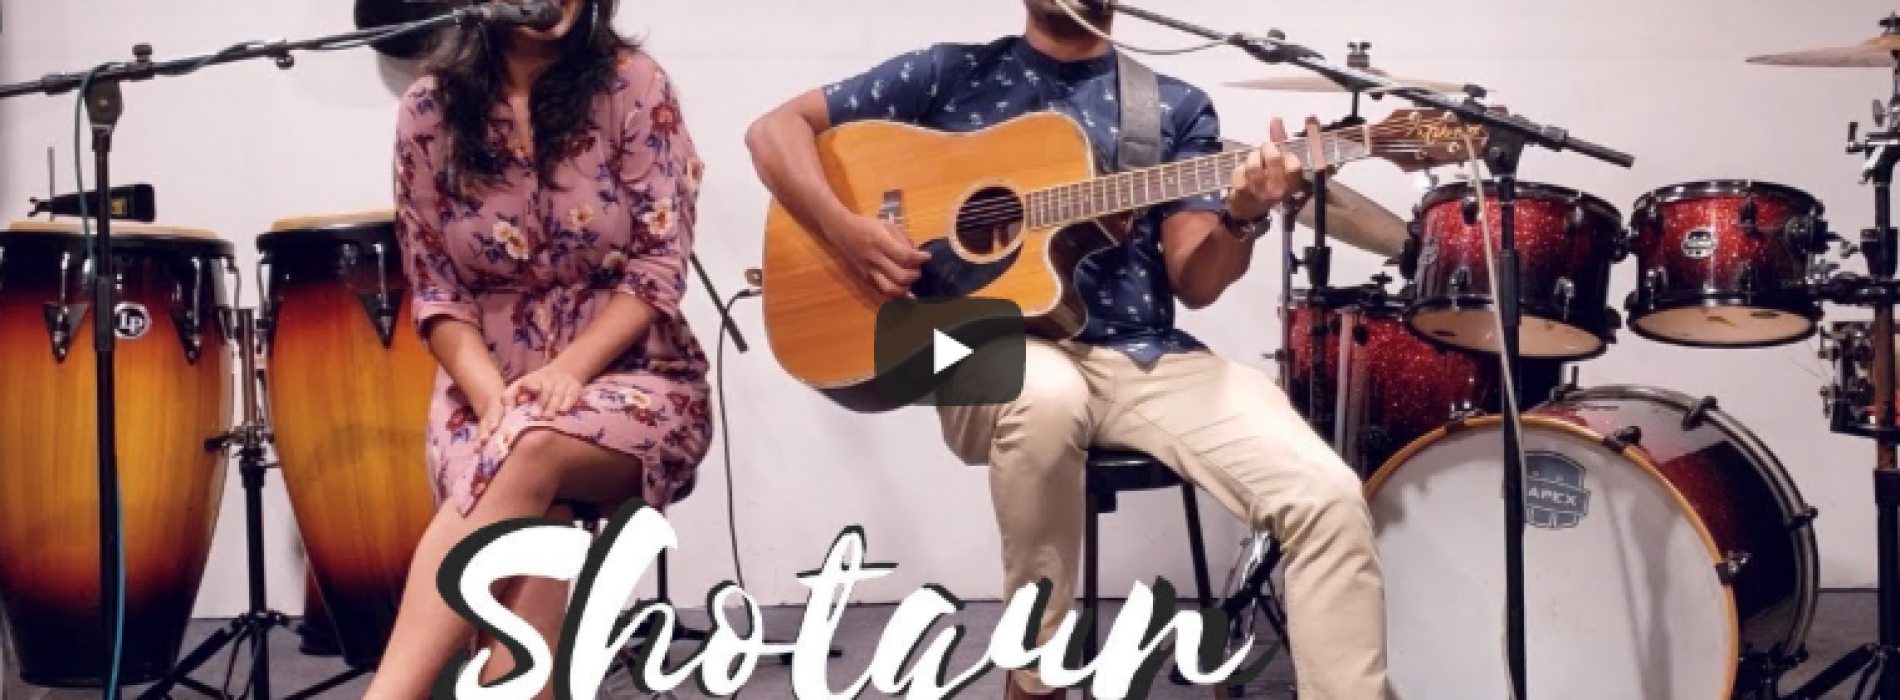 Shotgun – Sam & Andrea (George Ezra Cover)